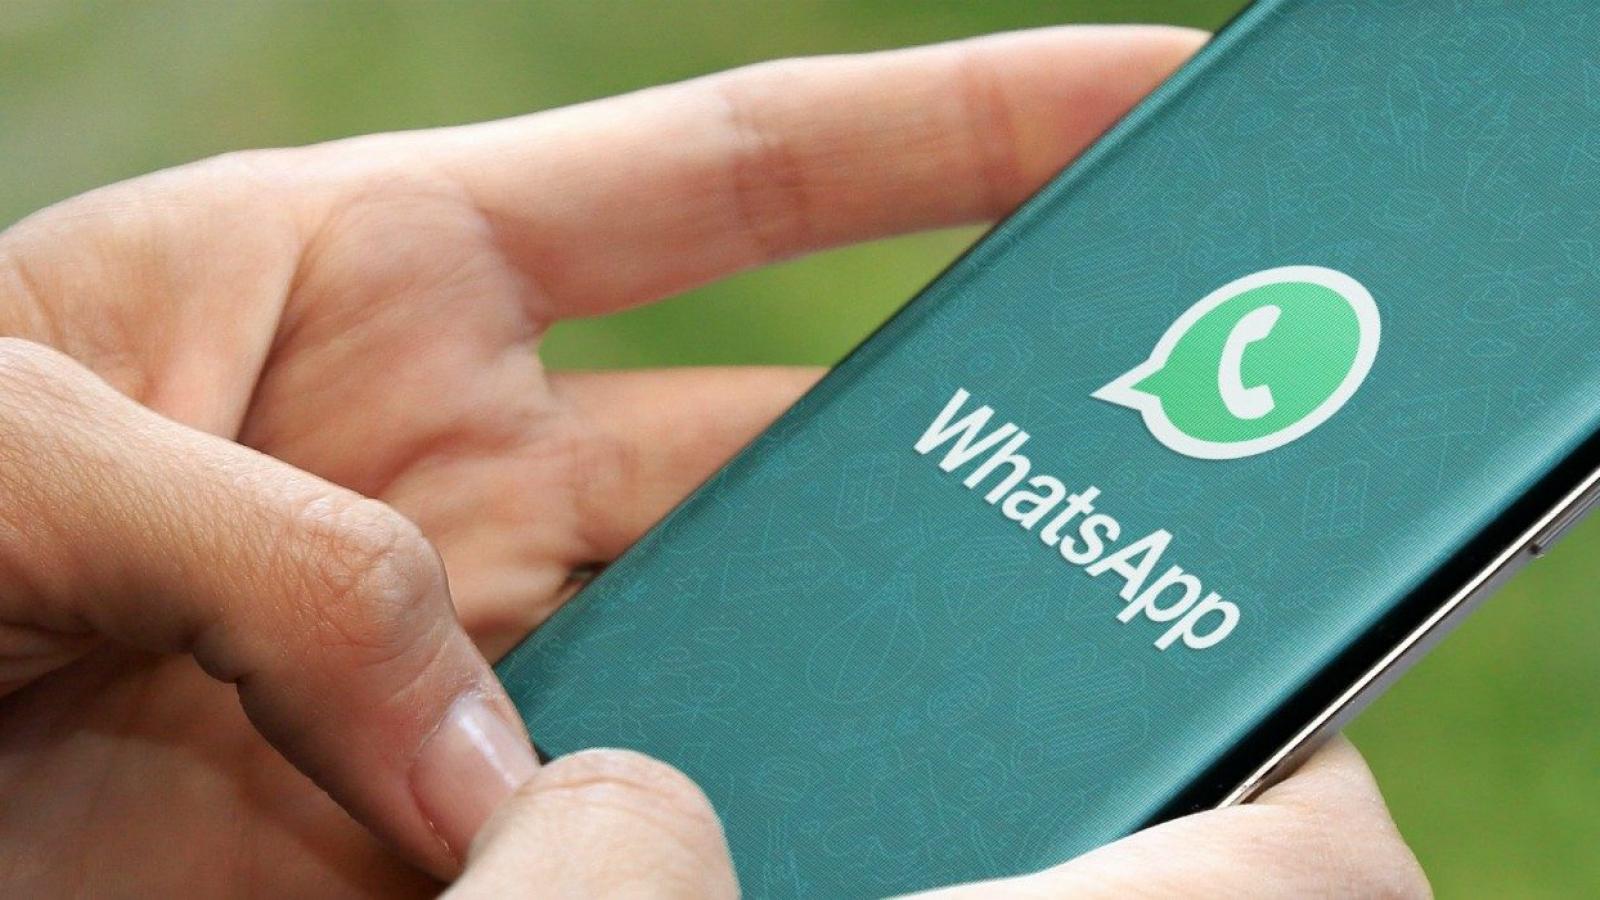 Whatsapp-blog-marketingstrategie-whatsappforbusiness